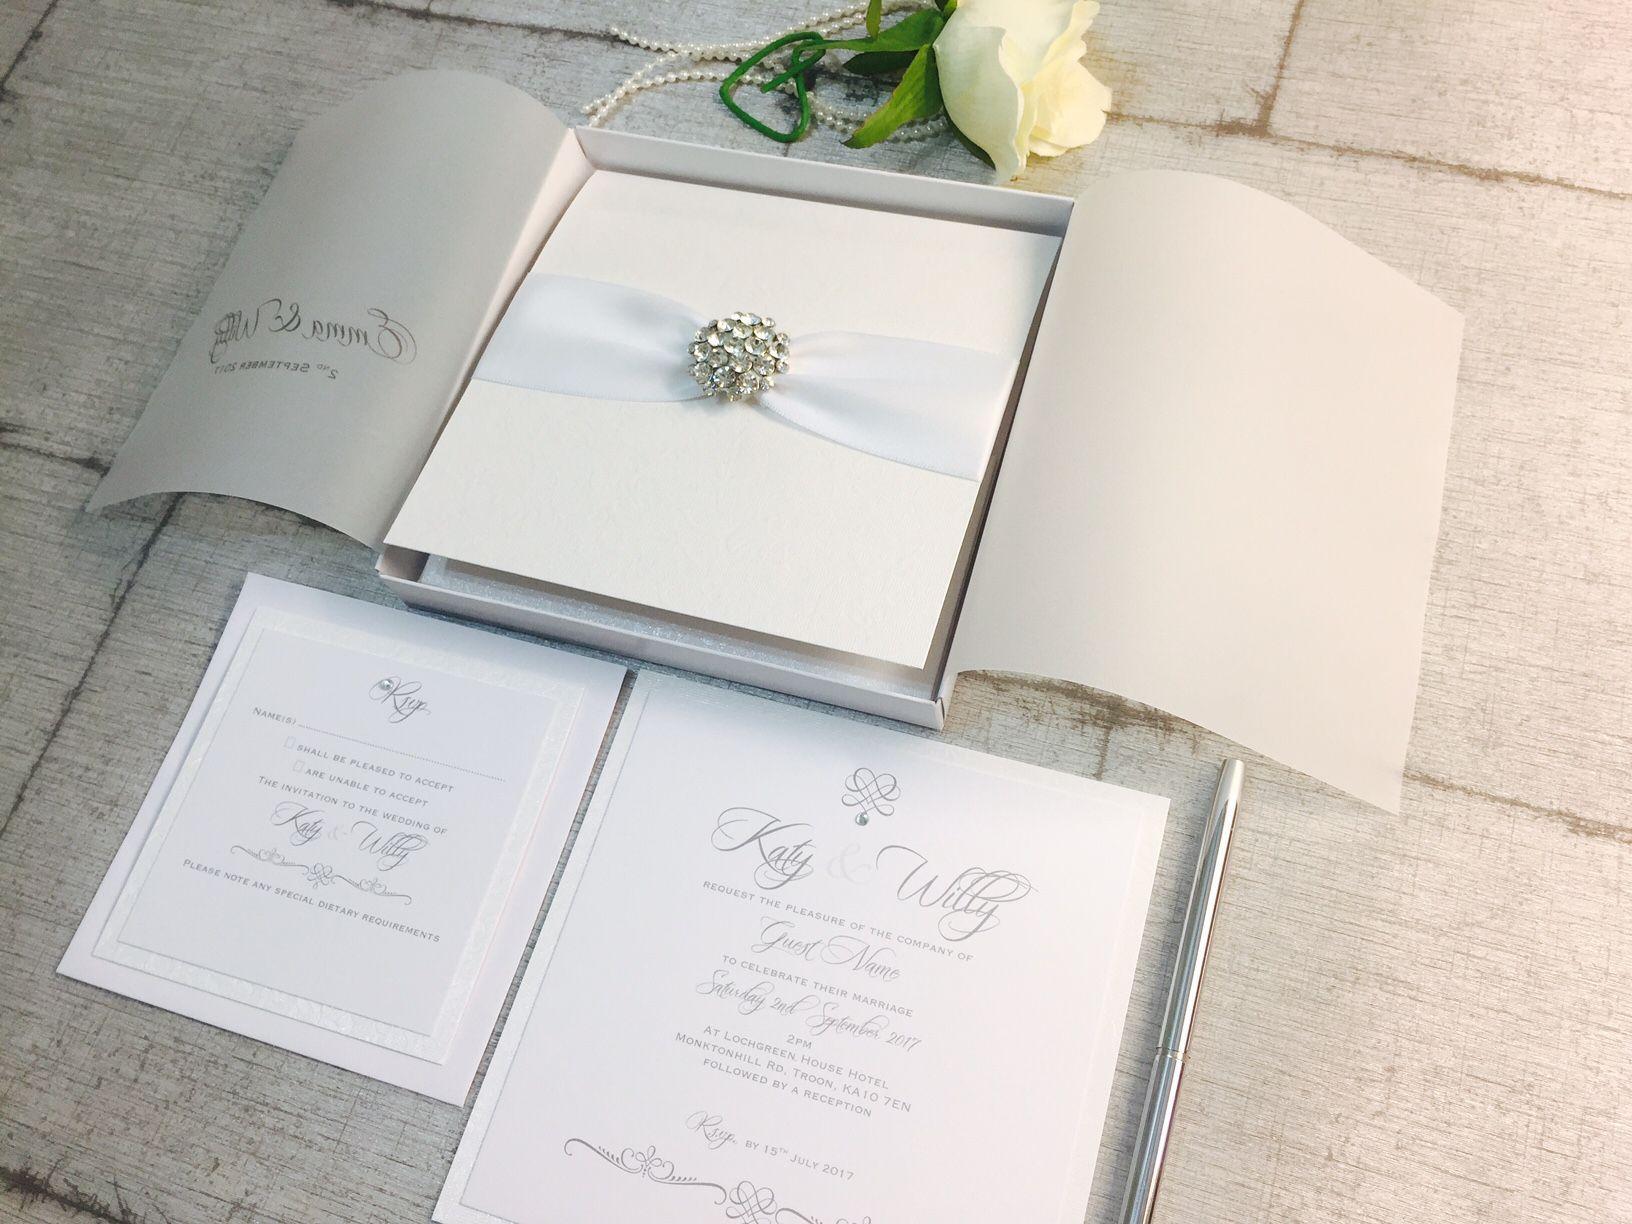 Boxed crystal wedding invitations | wedding invitations | Pinterest ...